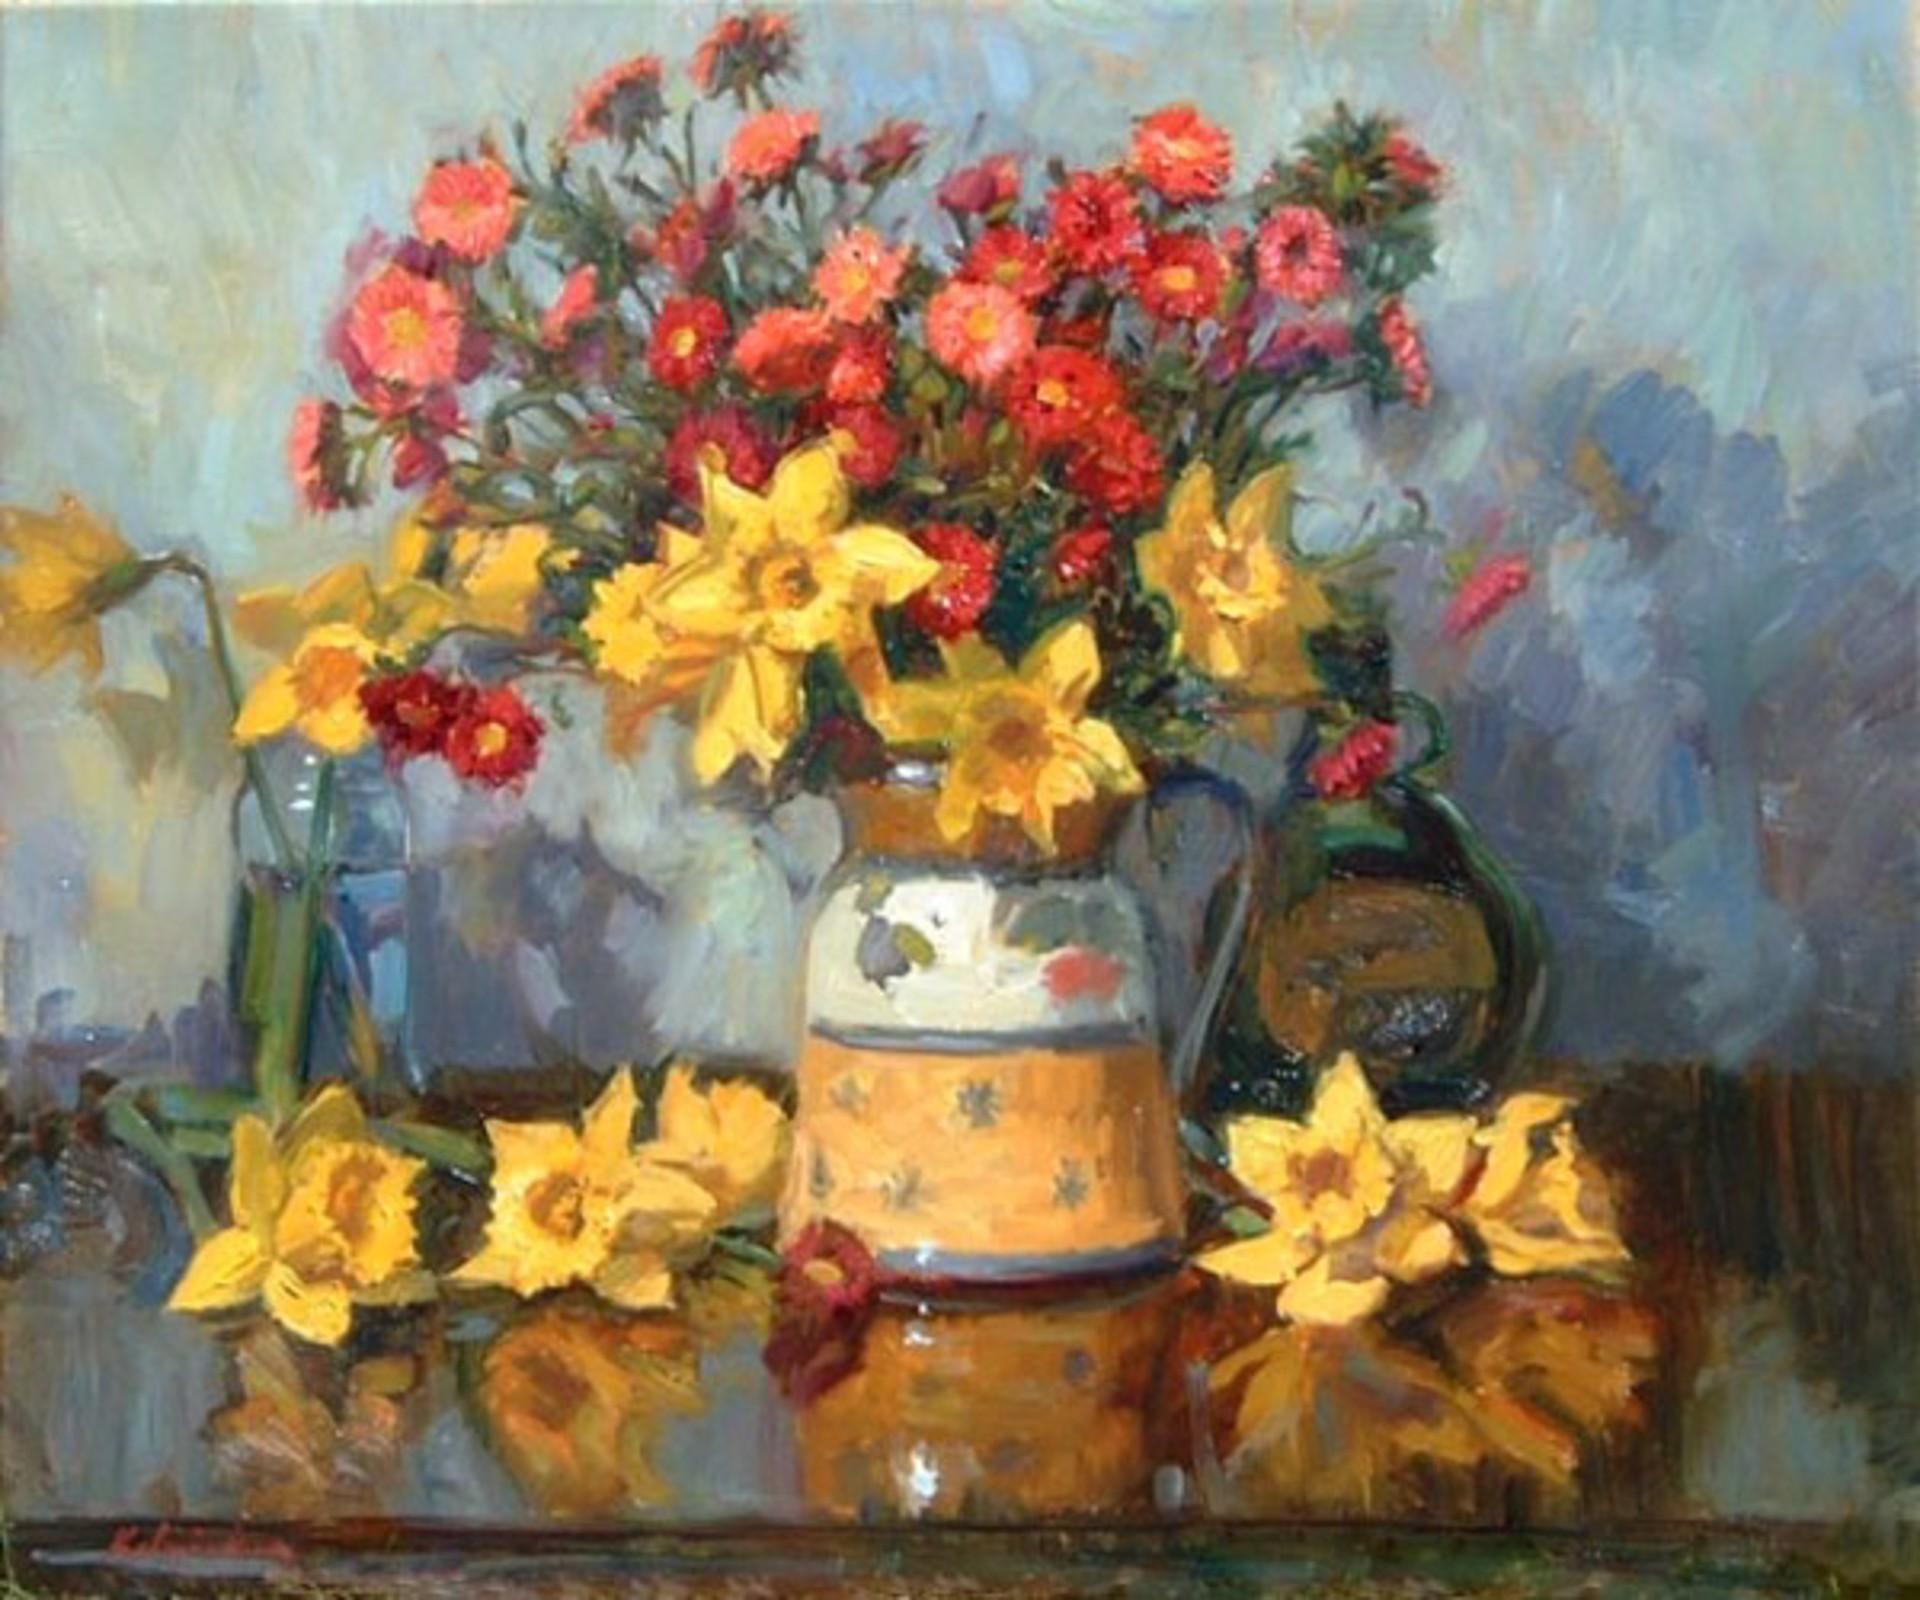 Daffodils in Pitcher by William J. Kalwick Jr.